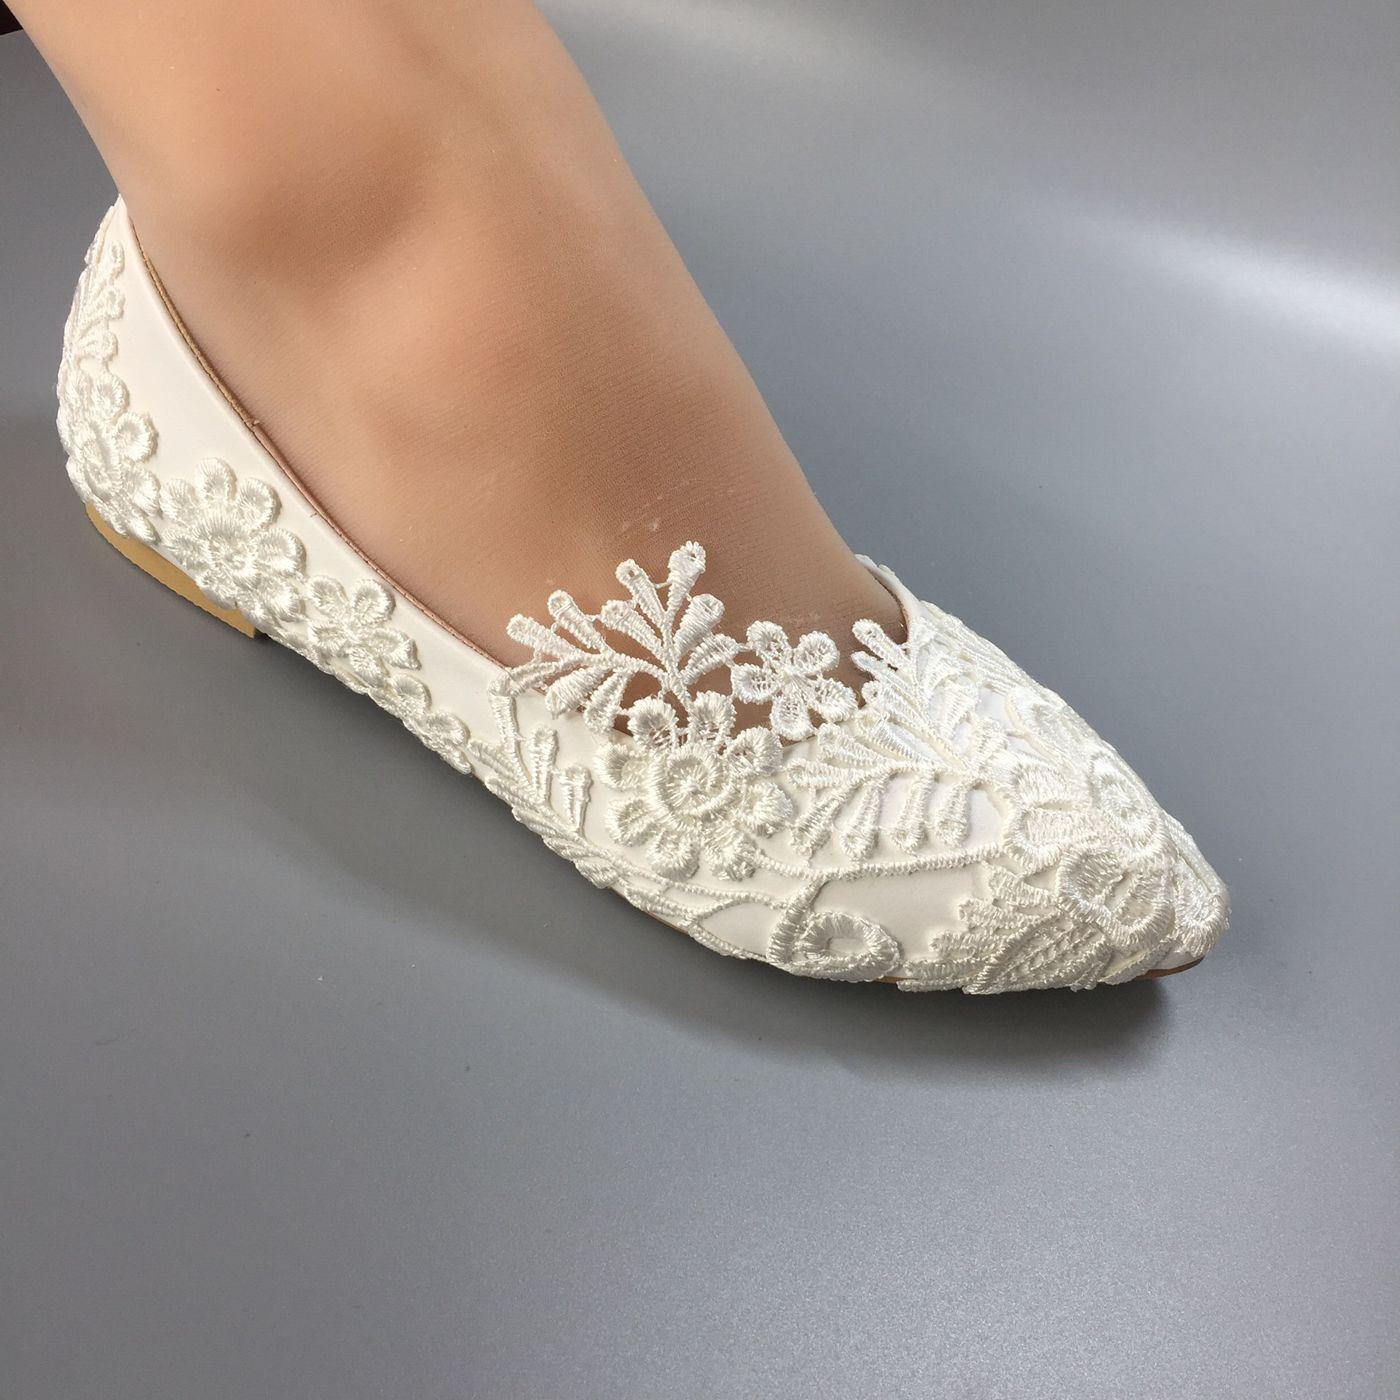 02cc5a2396d9 WOMEN Wedding Shoes Waterproof White Bride Wedding Dresses Han Edition  Diamond Lace Manual Wedding BRIDAL FLAT Shoe Female SIZE EU 35 42 Canada  2019 From ...